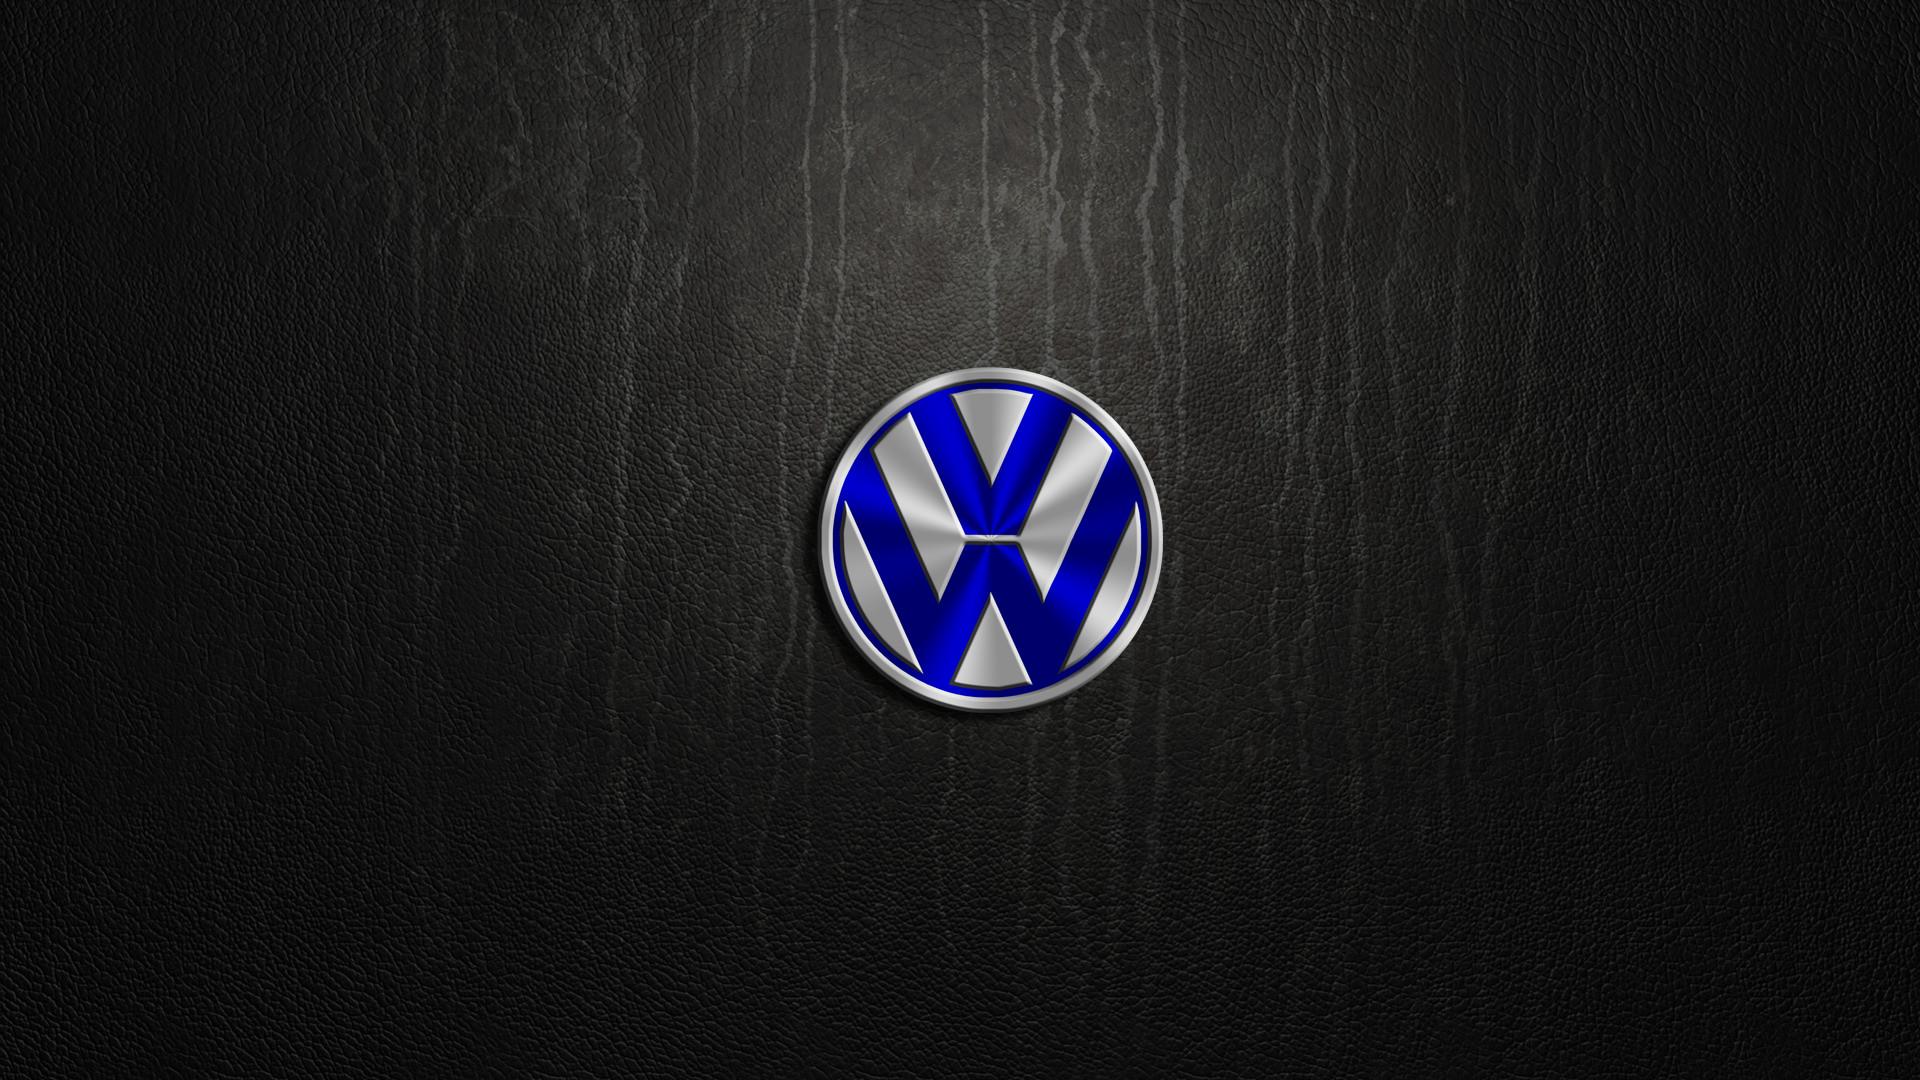 Volkswagen Wallpaper Picture #1Yw | Cars | Pinterest | Wallpaper pictures,  Volkswagen and Wallpaper